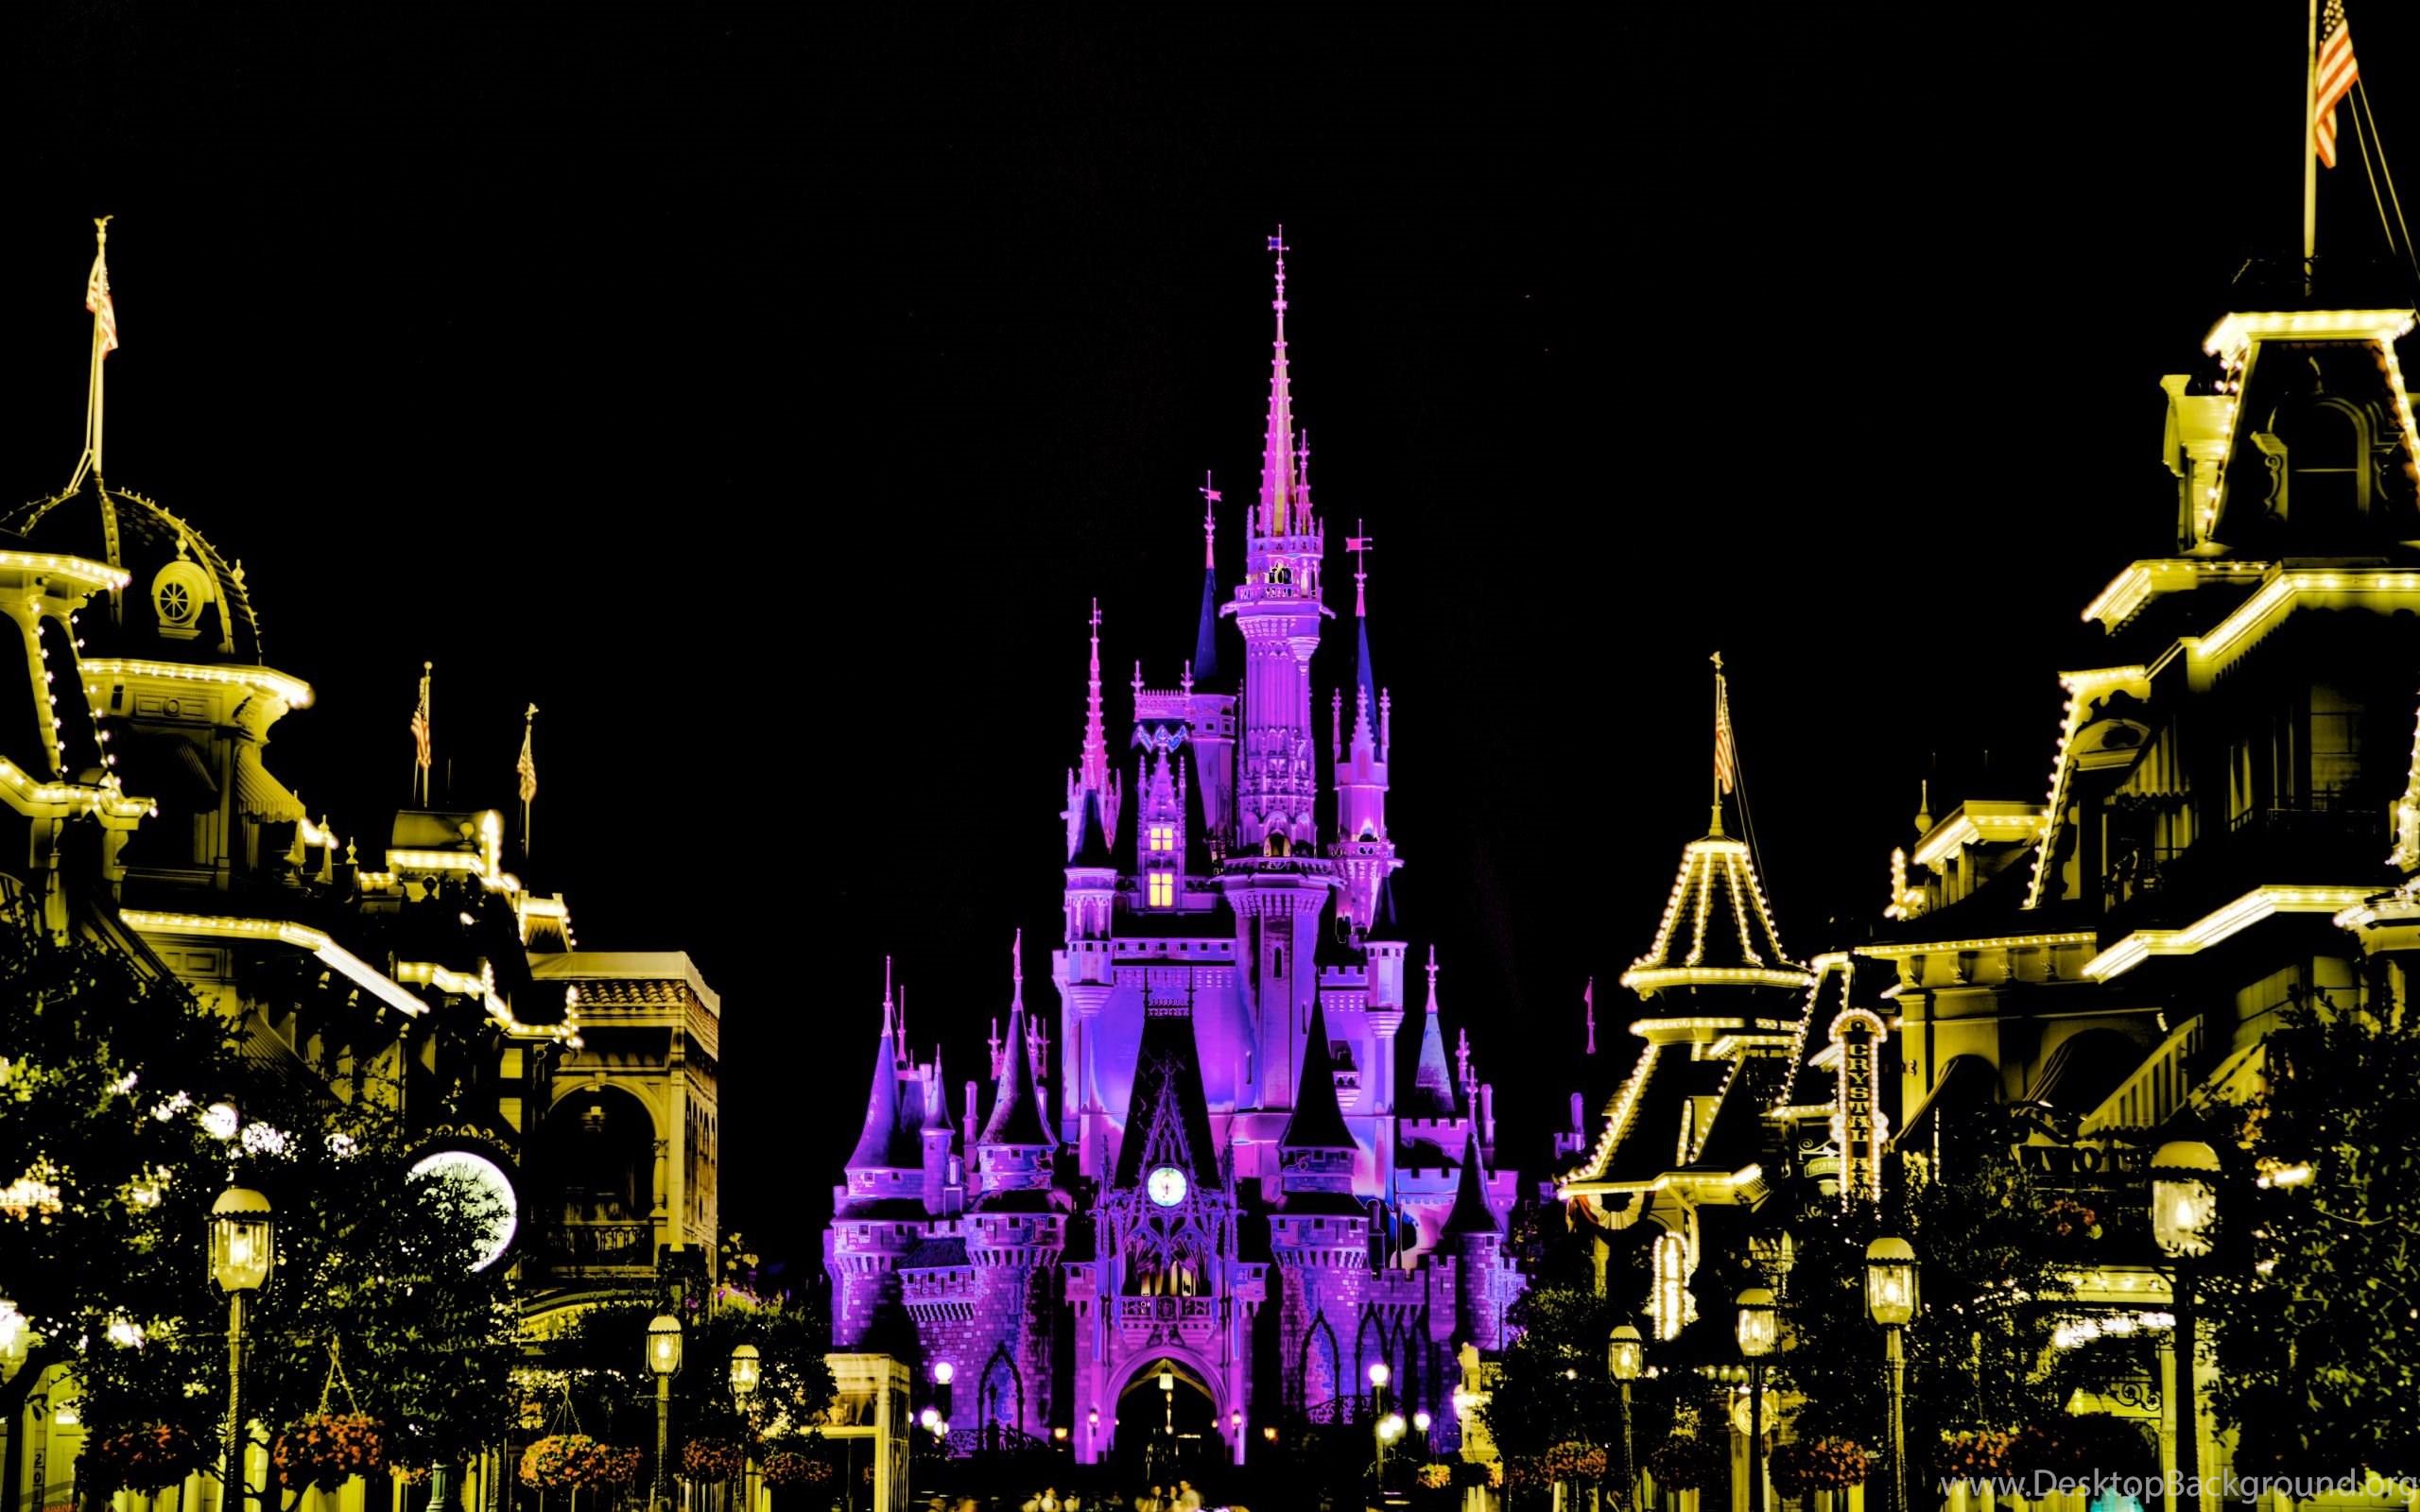 Cinderella Castle Wallpapers Atdisneyagain Desktop Background